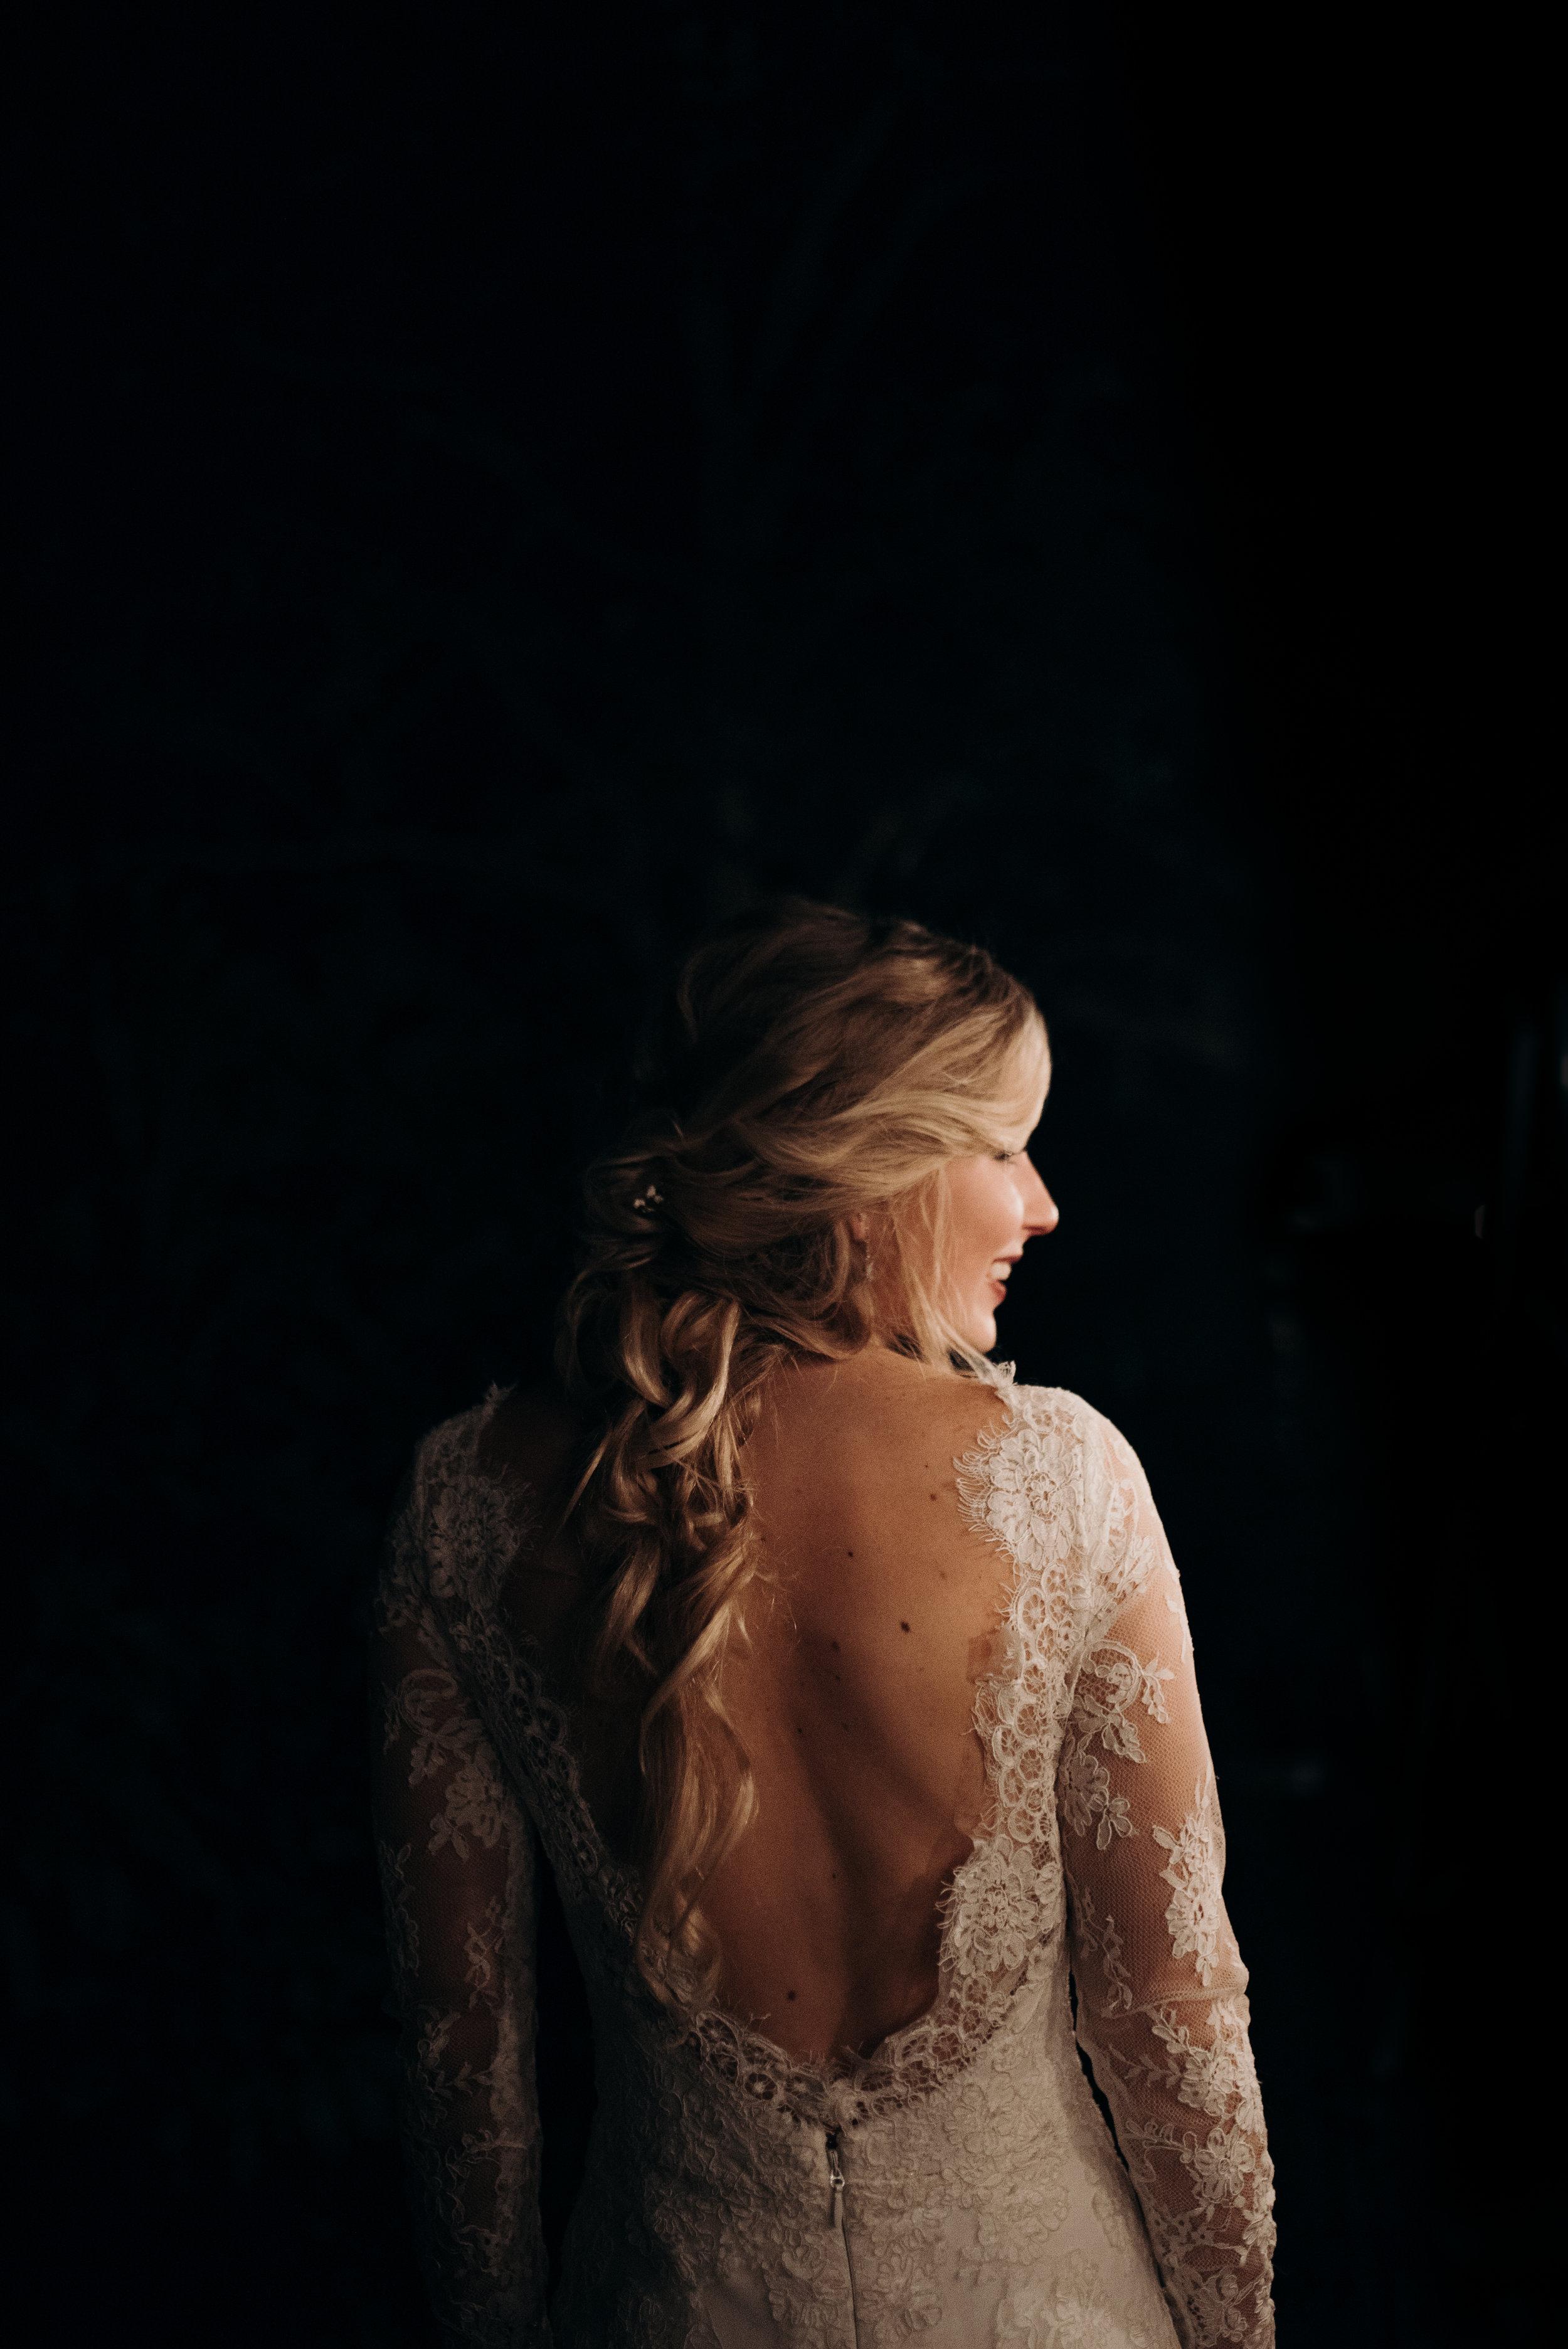 micayla-greyson-neumann-vero-beach-lake-house-winter-white-wedding-photography-1237.jpg